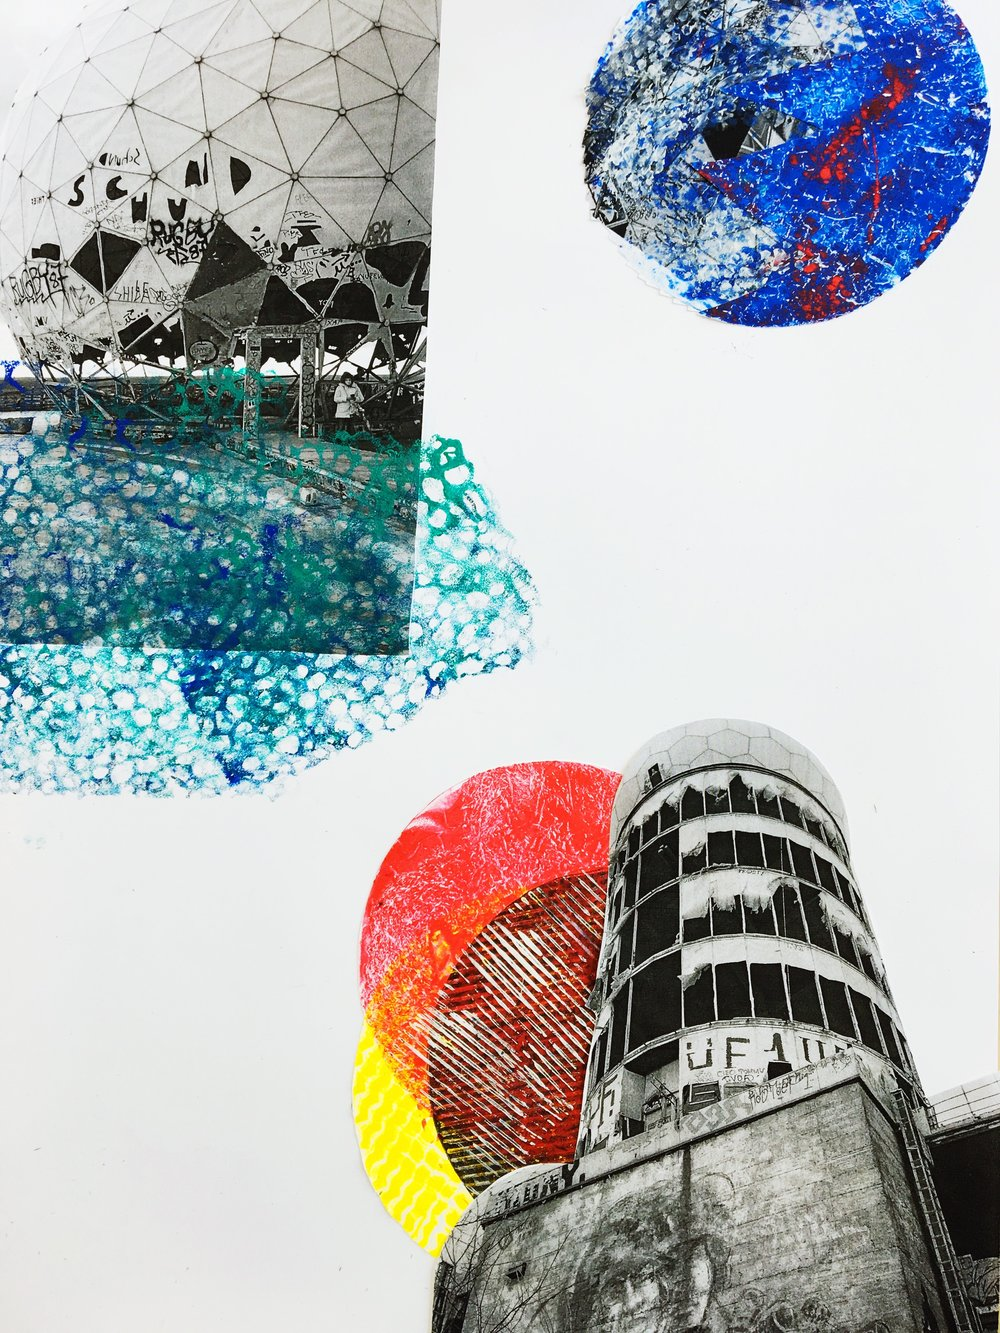 Teufelsberg Berlin, Graphic art workshop for kids Berlin birthday